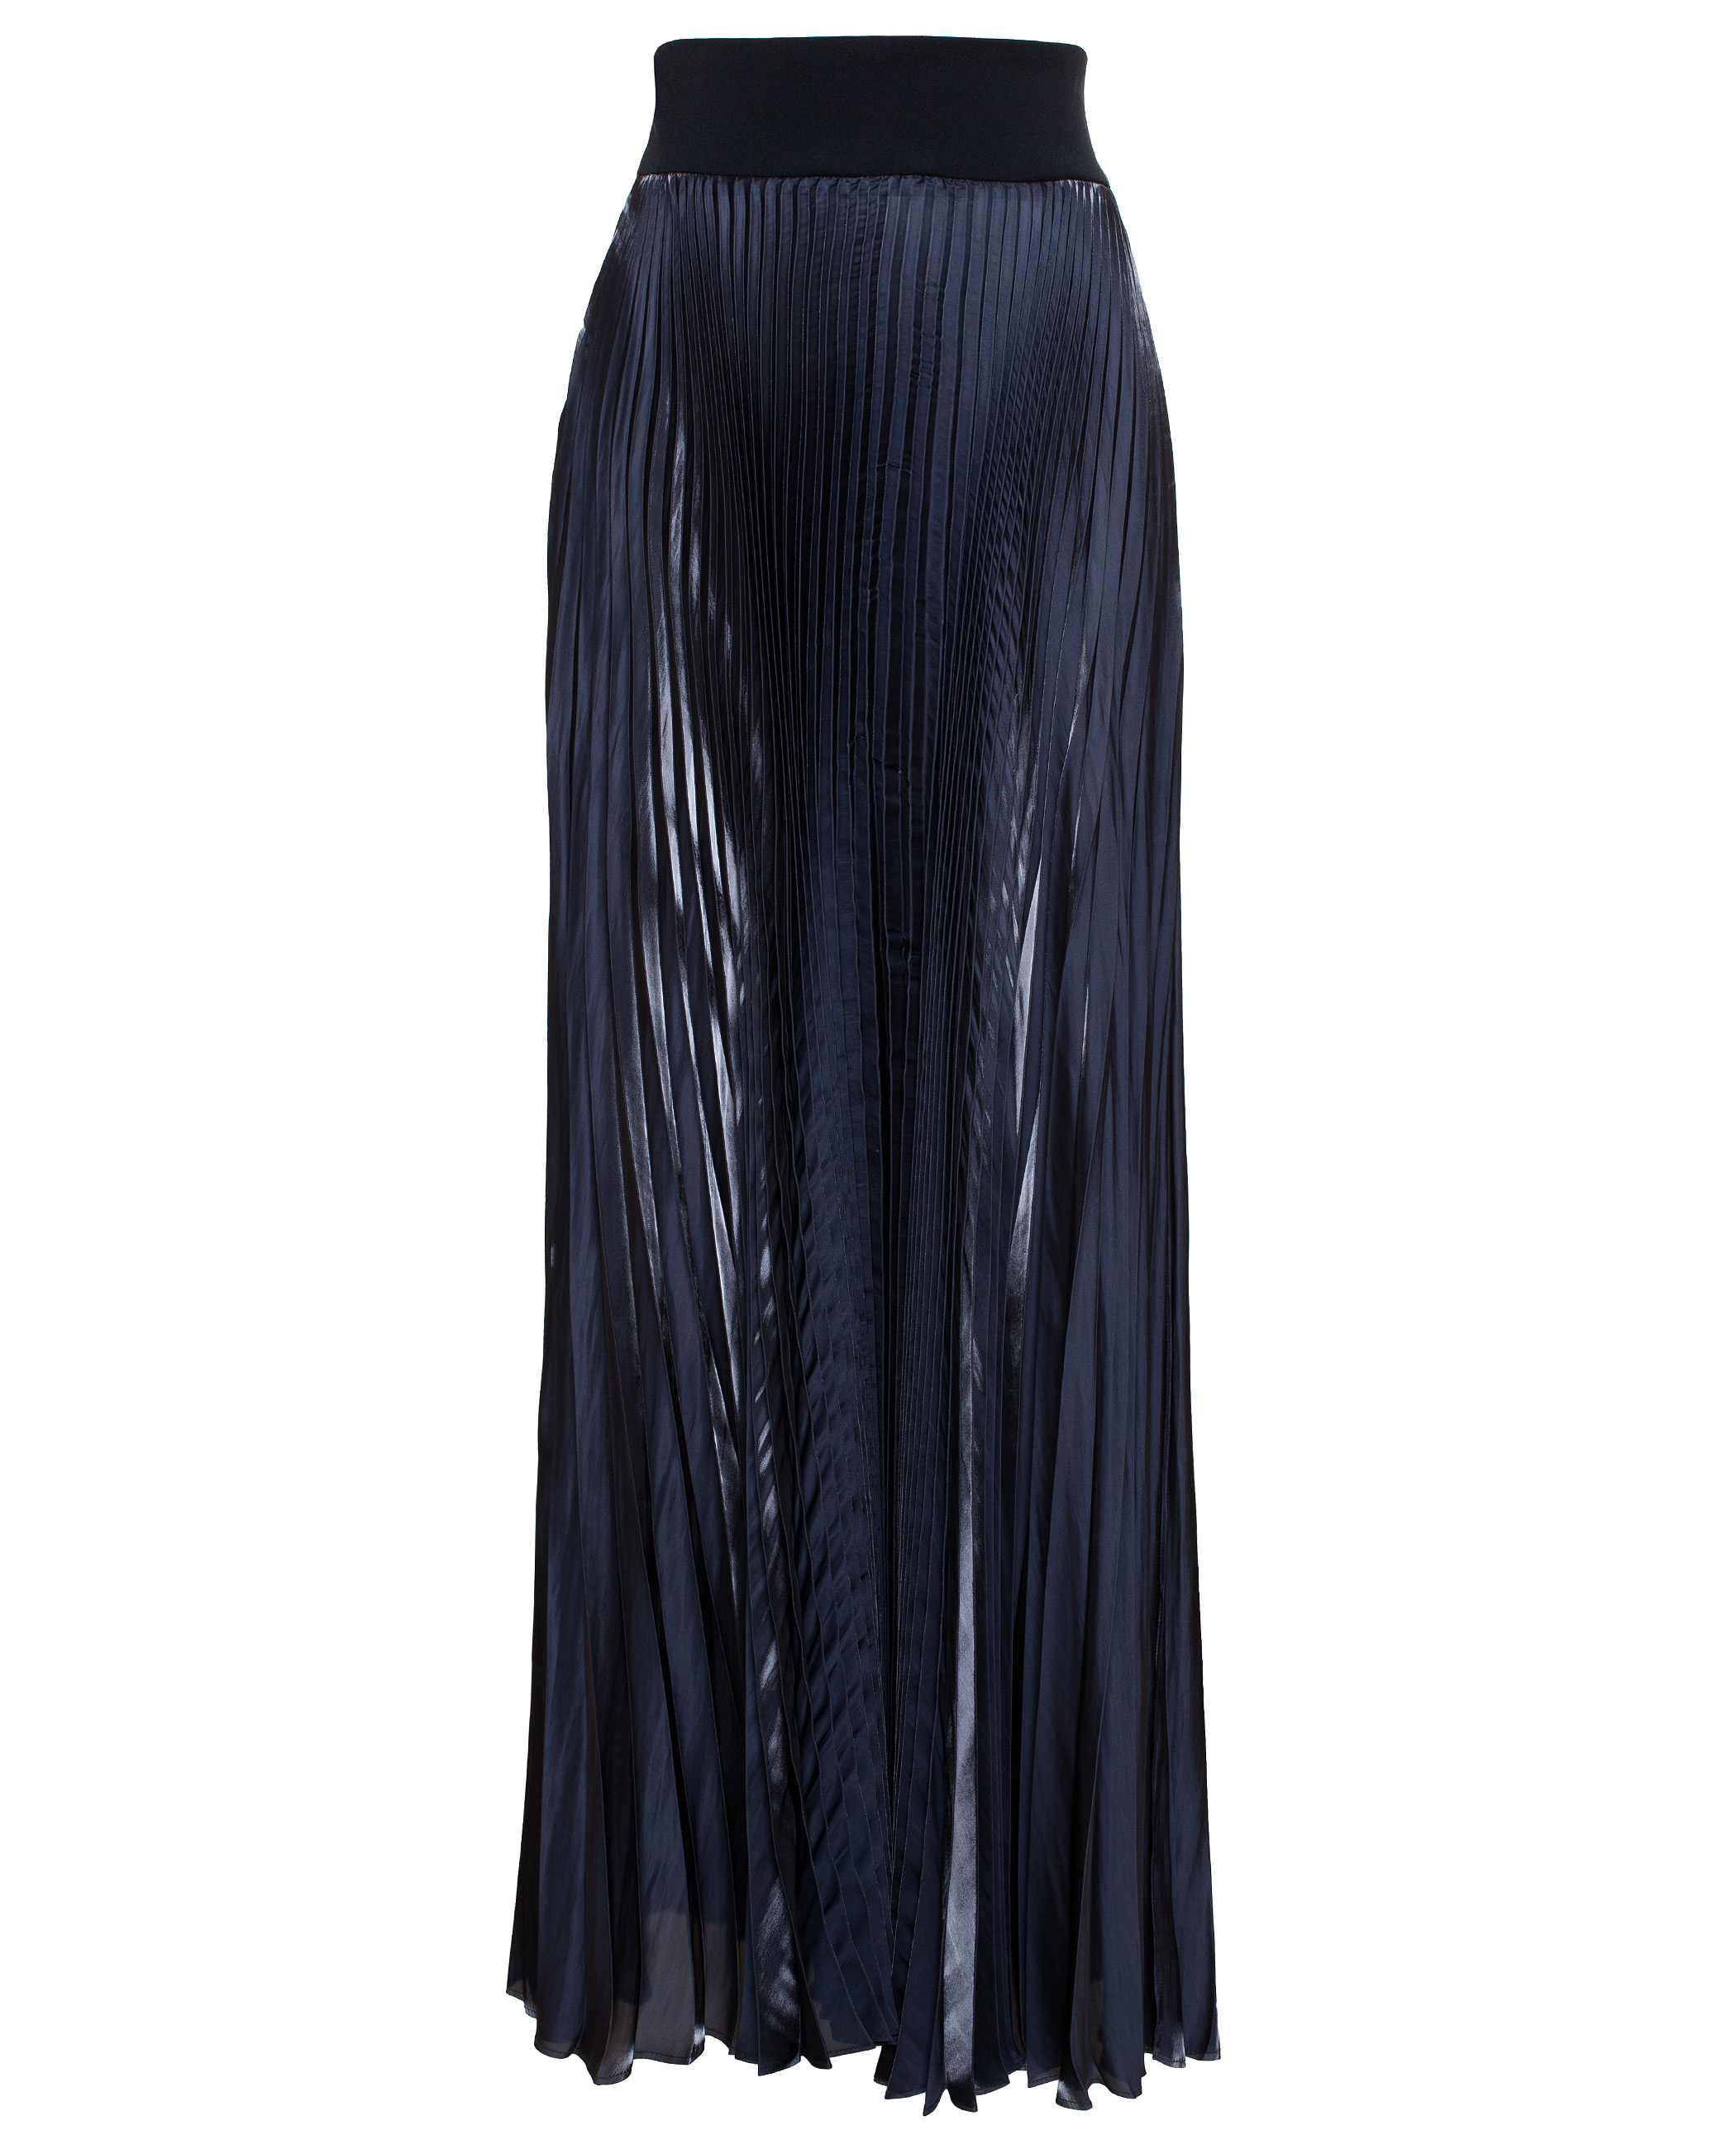 galvan pleated maxi skirt in black lyst